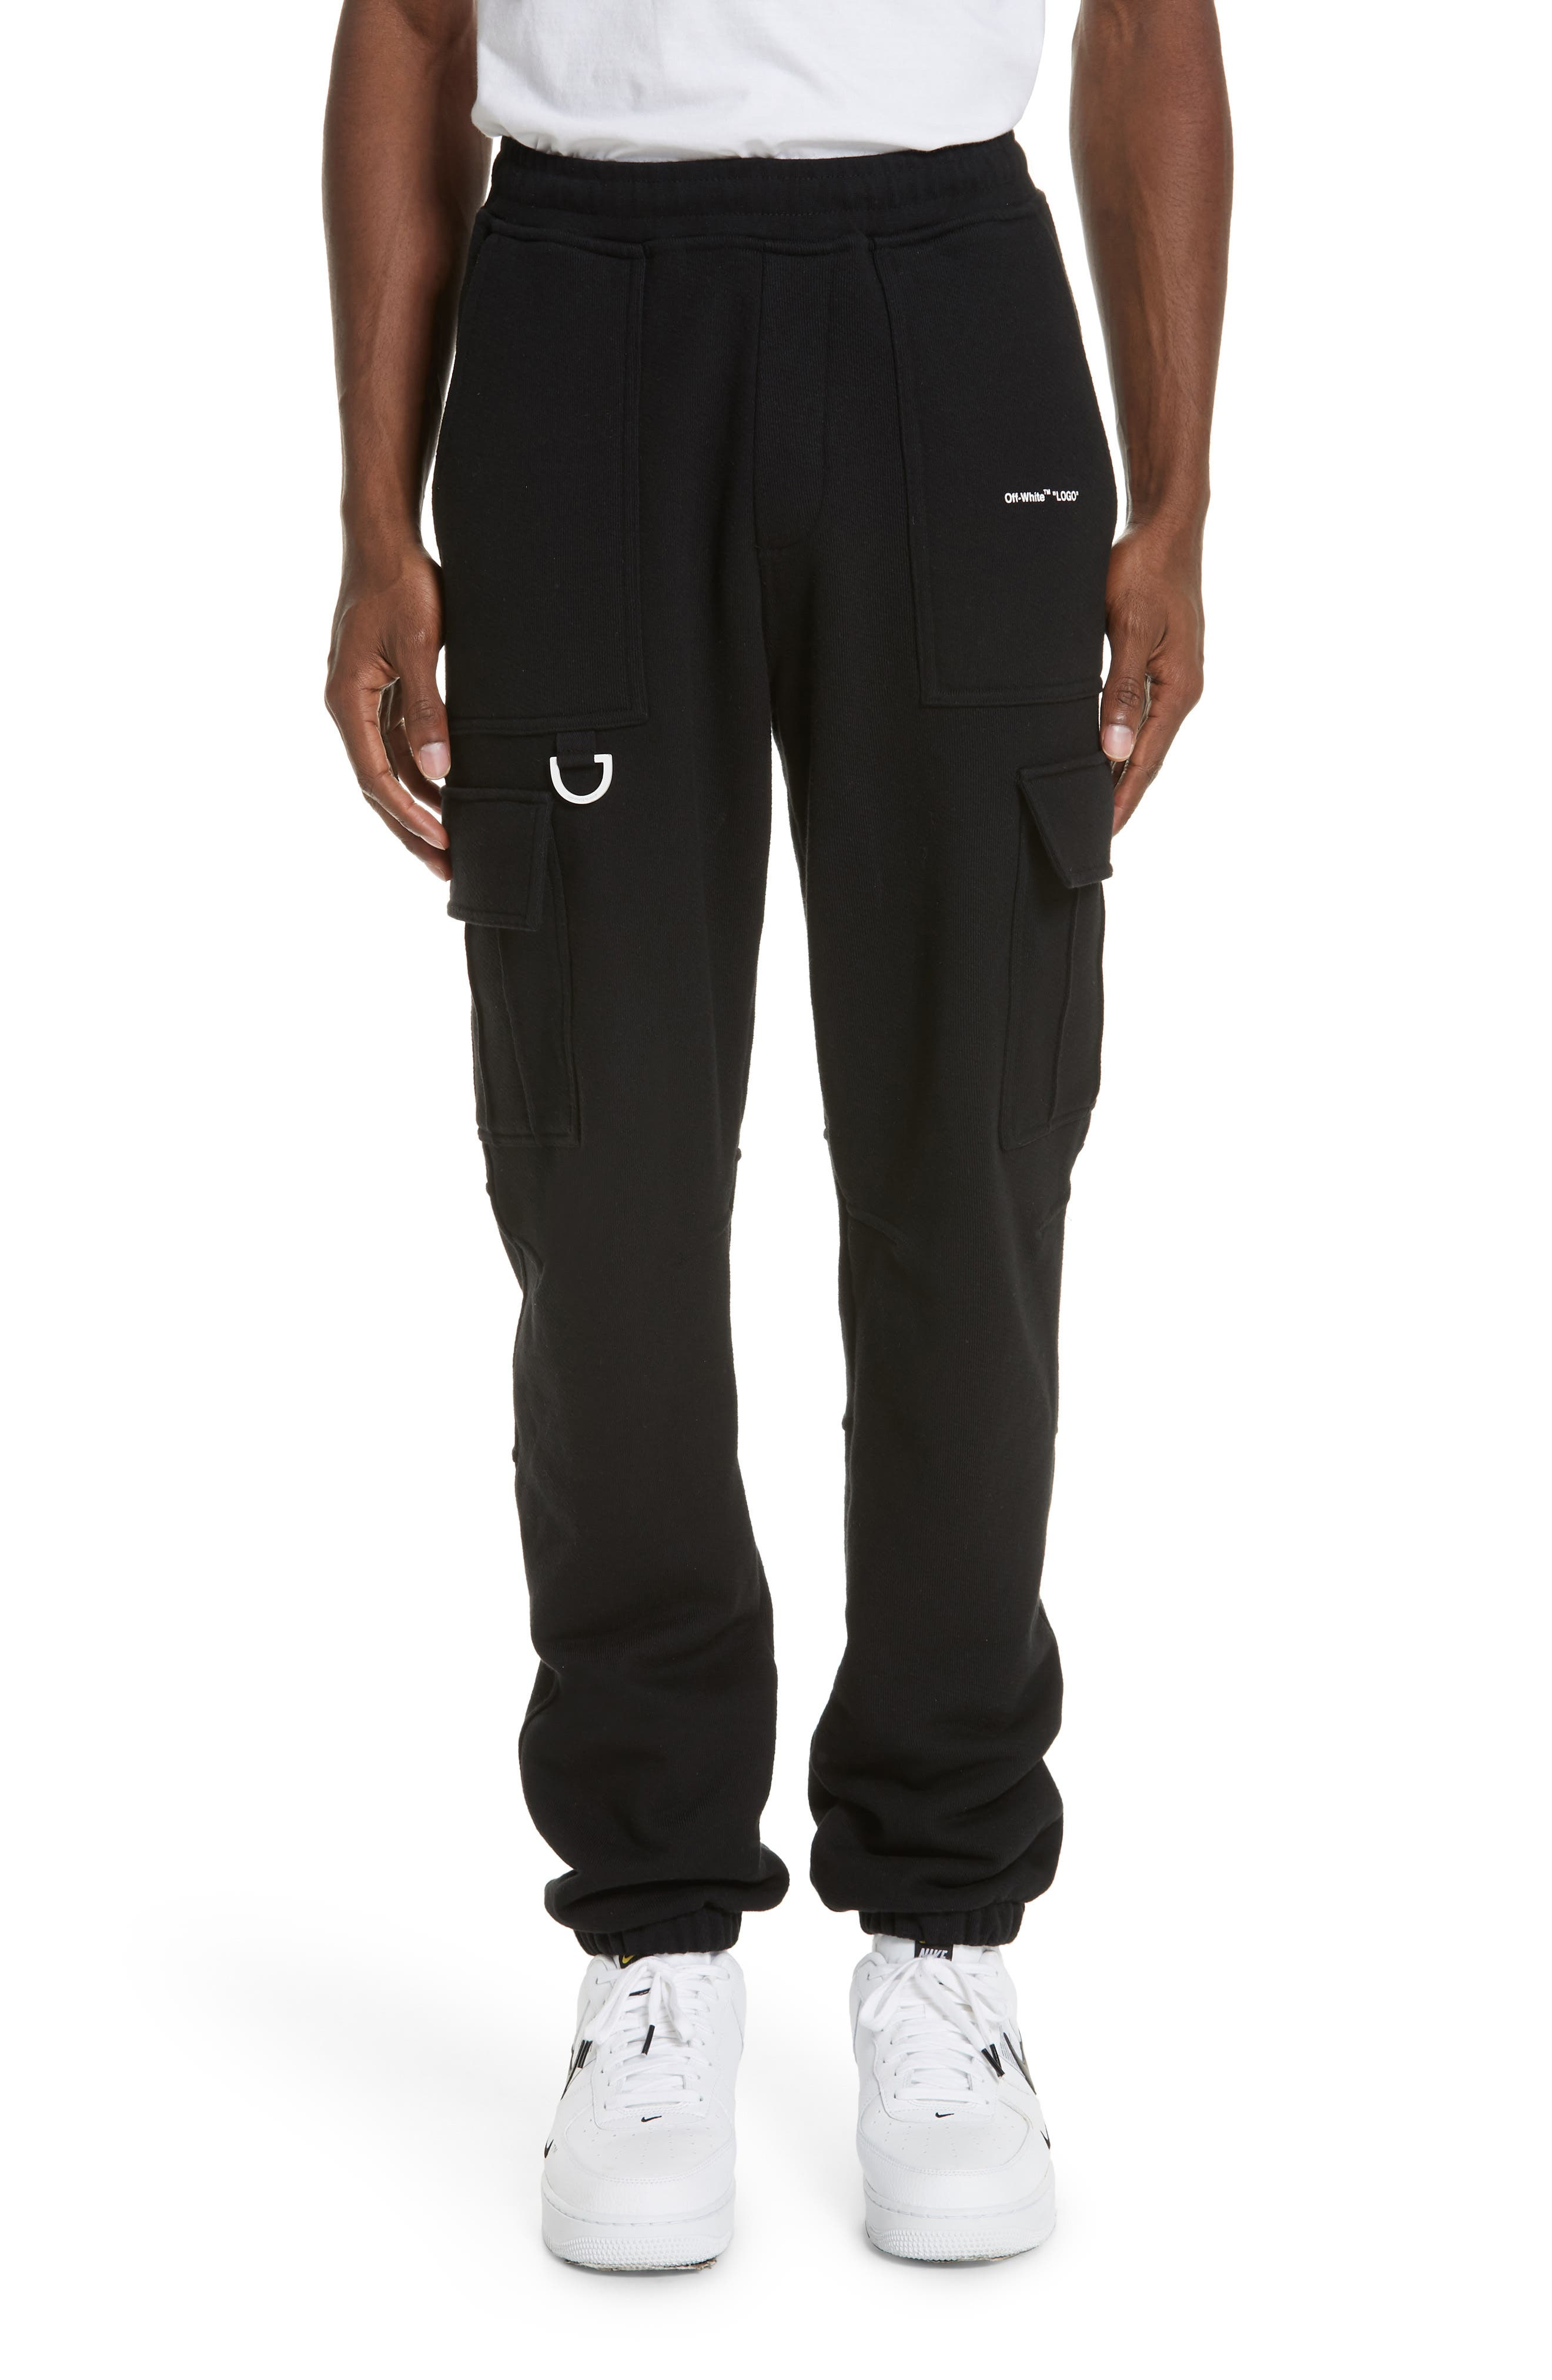 OFF-WHITE, Cargo Jogger Pants, Main thumbnail 1, color, BLACK